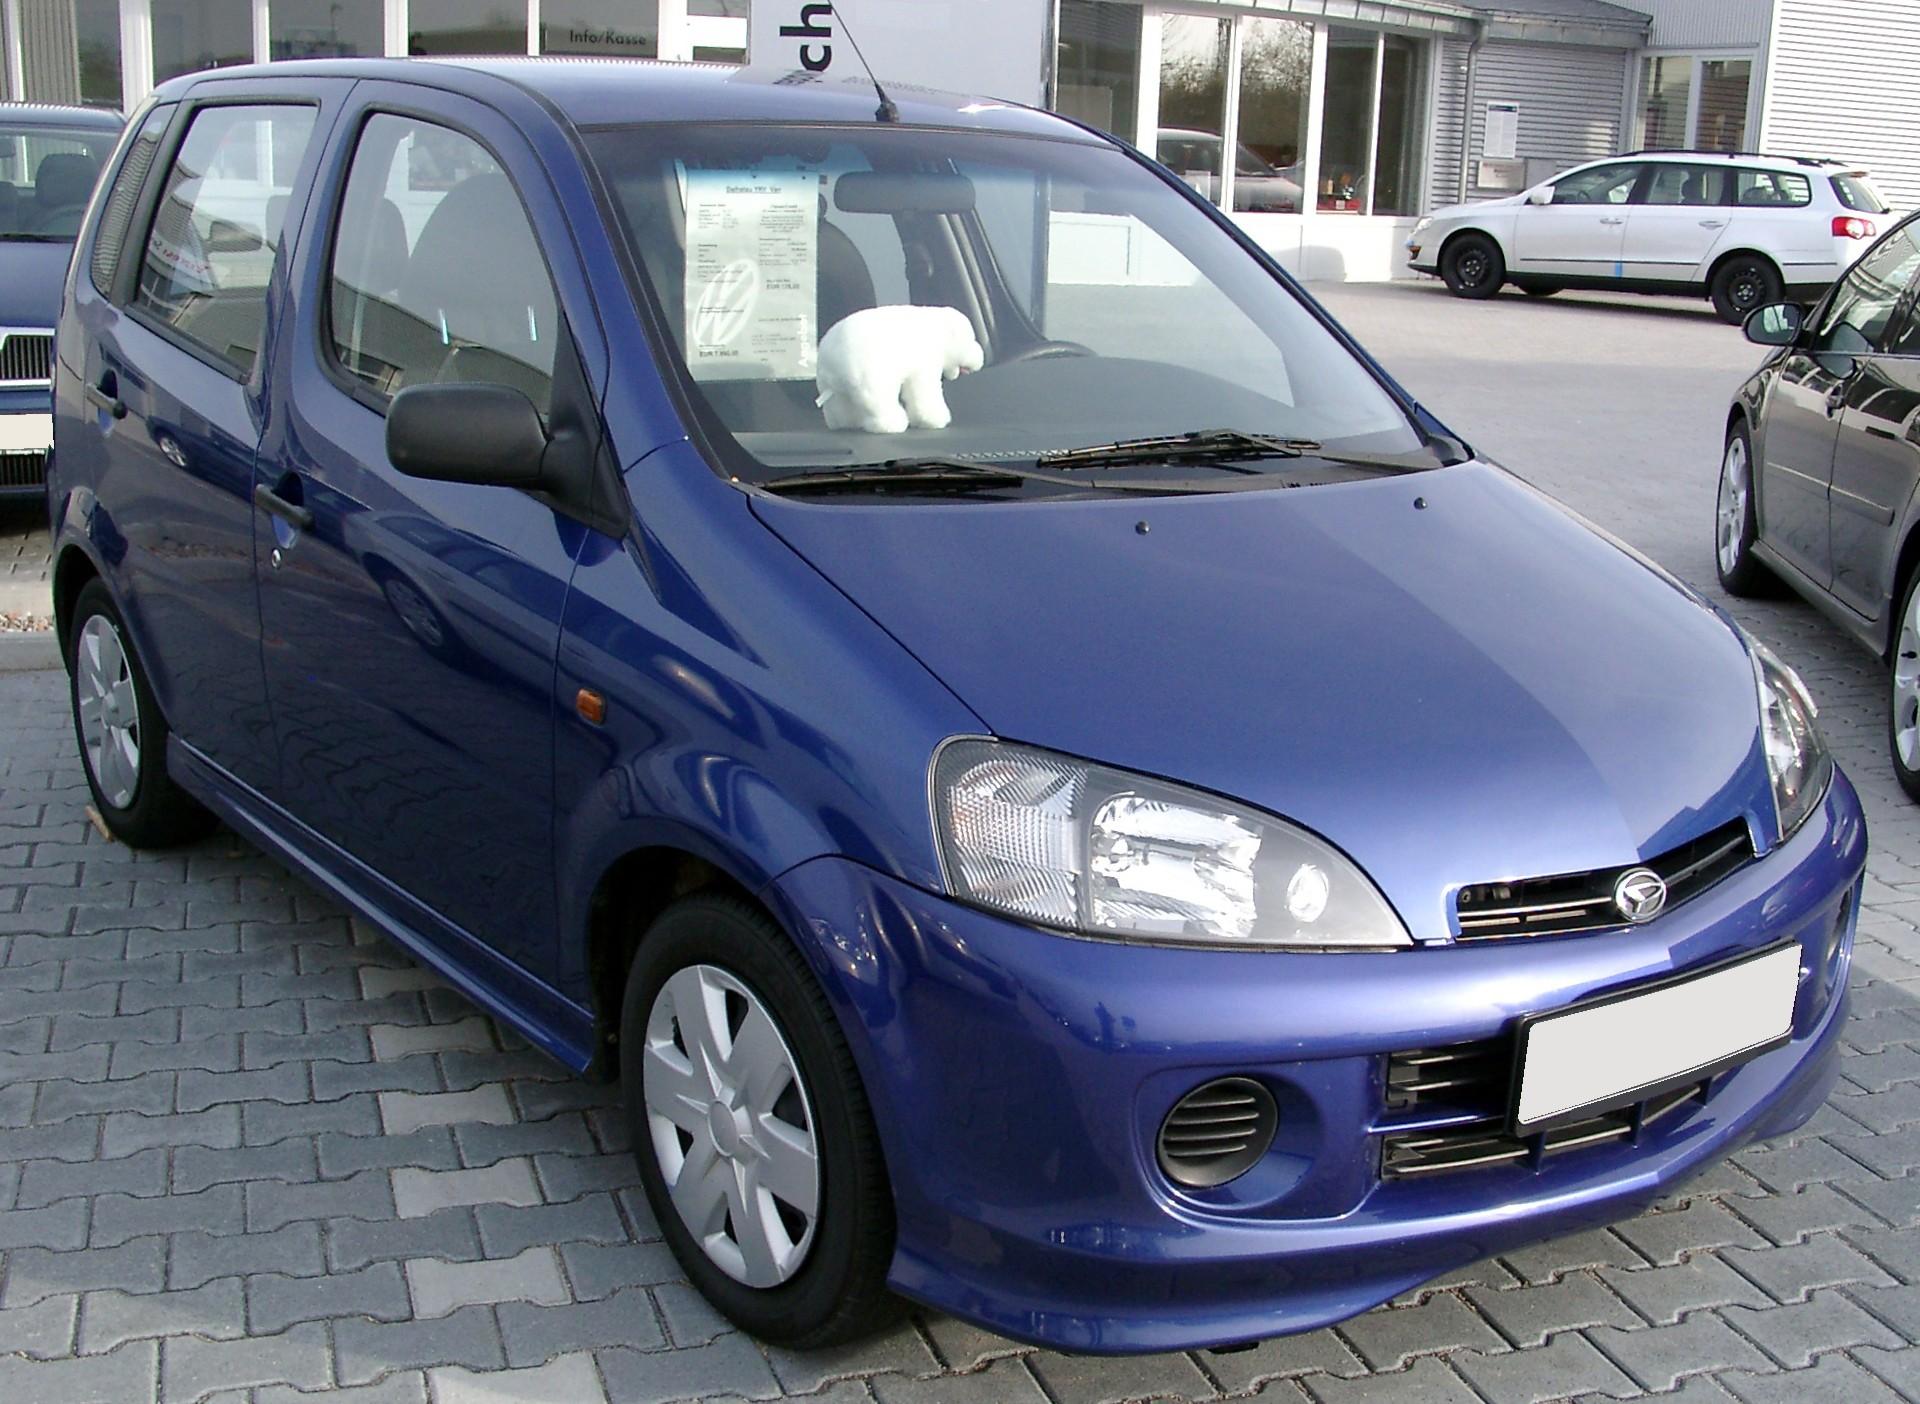 Daihatsu yrv turbo